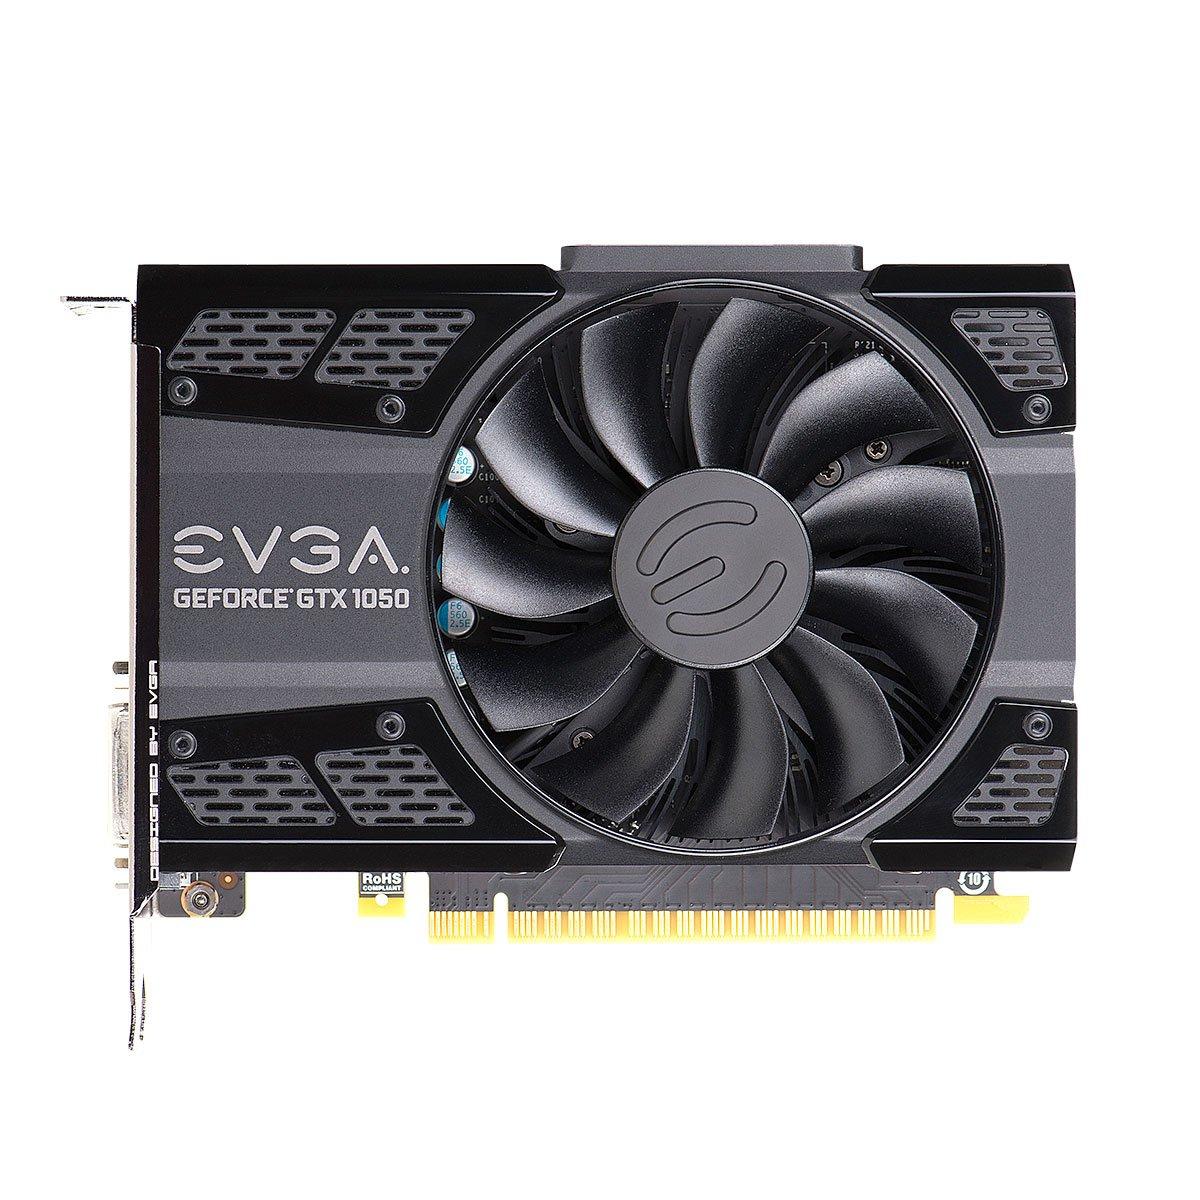 EVGA GeForce GTX 1050 Ti SC GAMING, 4GB GDDR5, DX12 OSD Support (PXOC) Graphics Card 04G-P4-6253-KR by EVGA (Image #7)